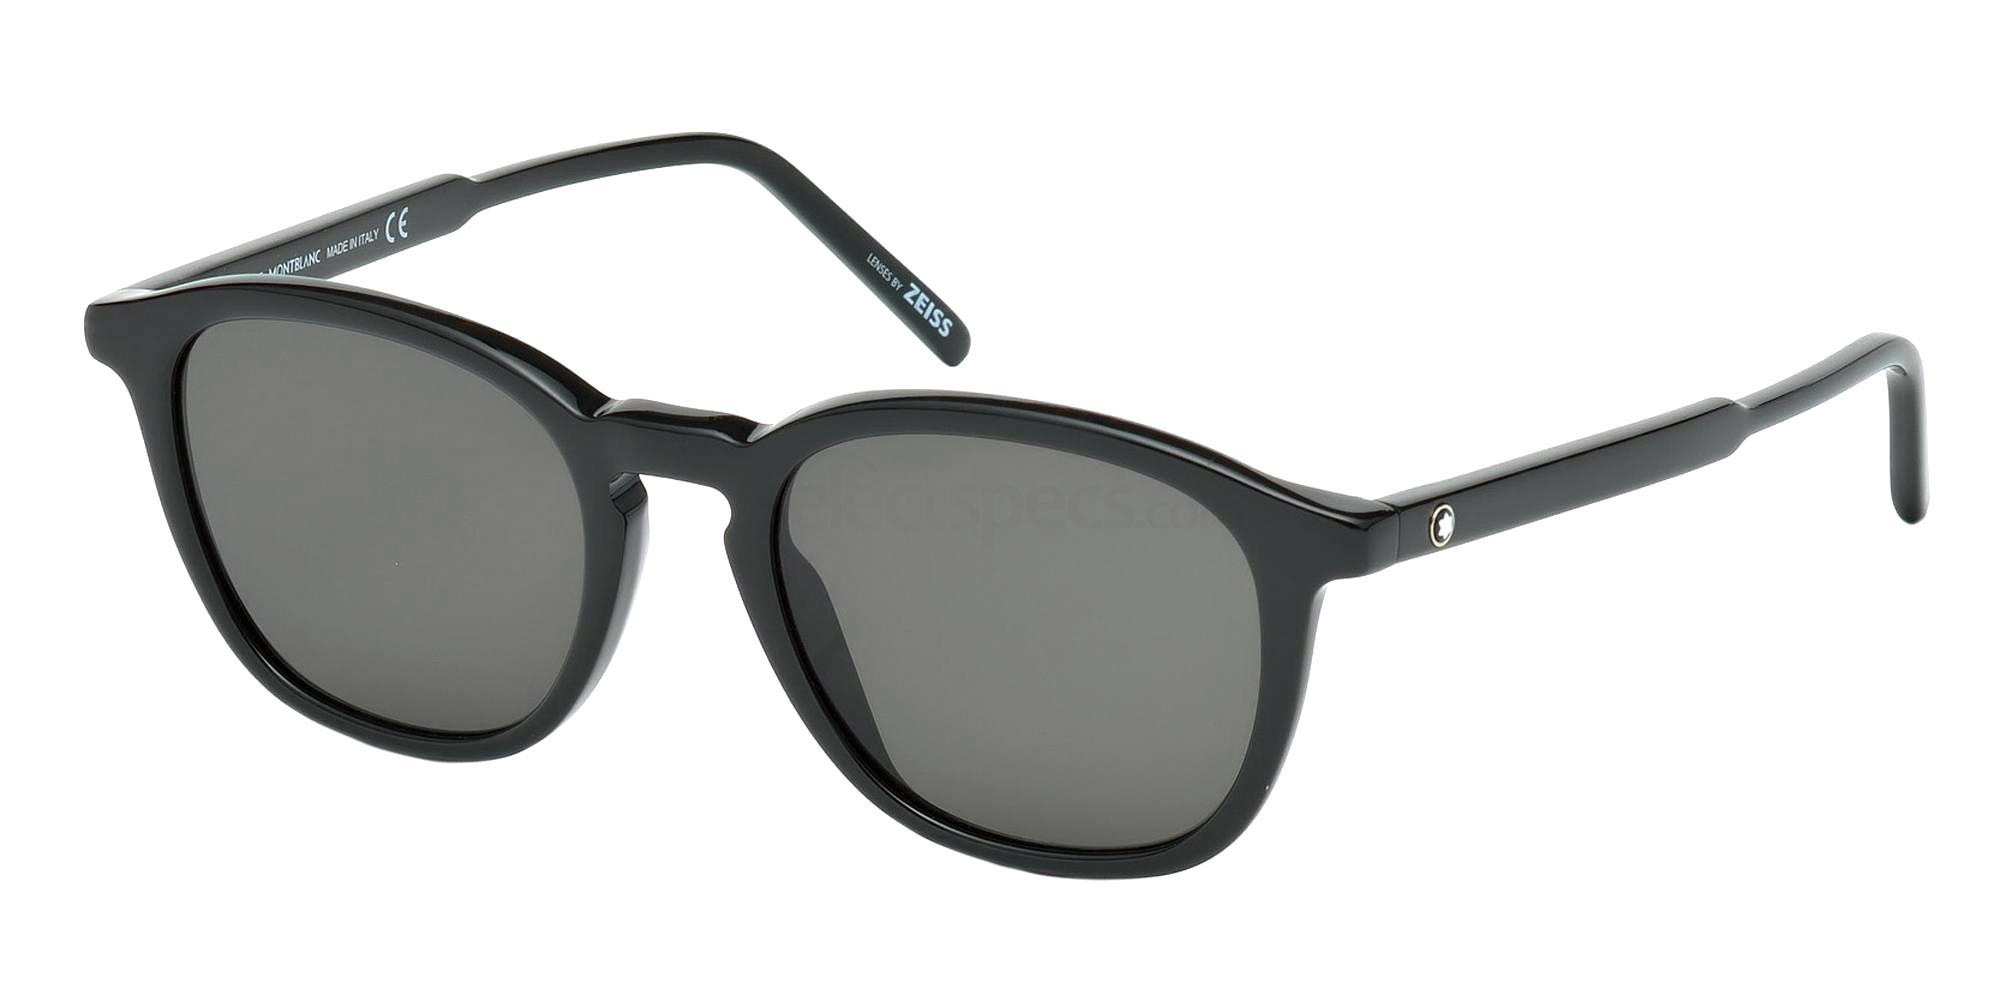 01A MB592S Sunglasses, Mont Blanc